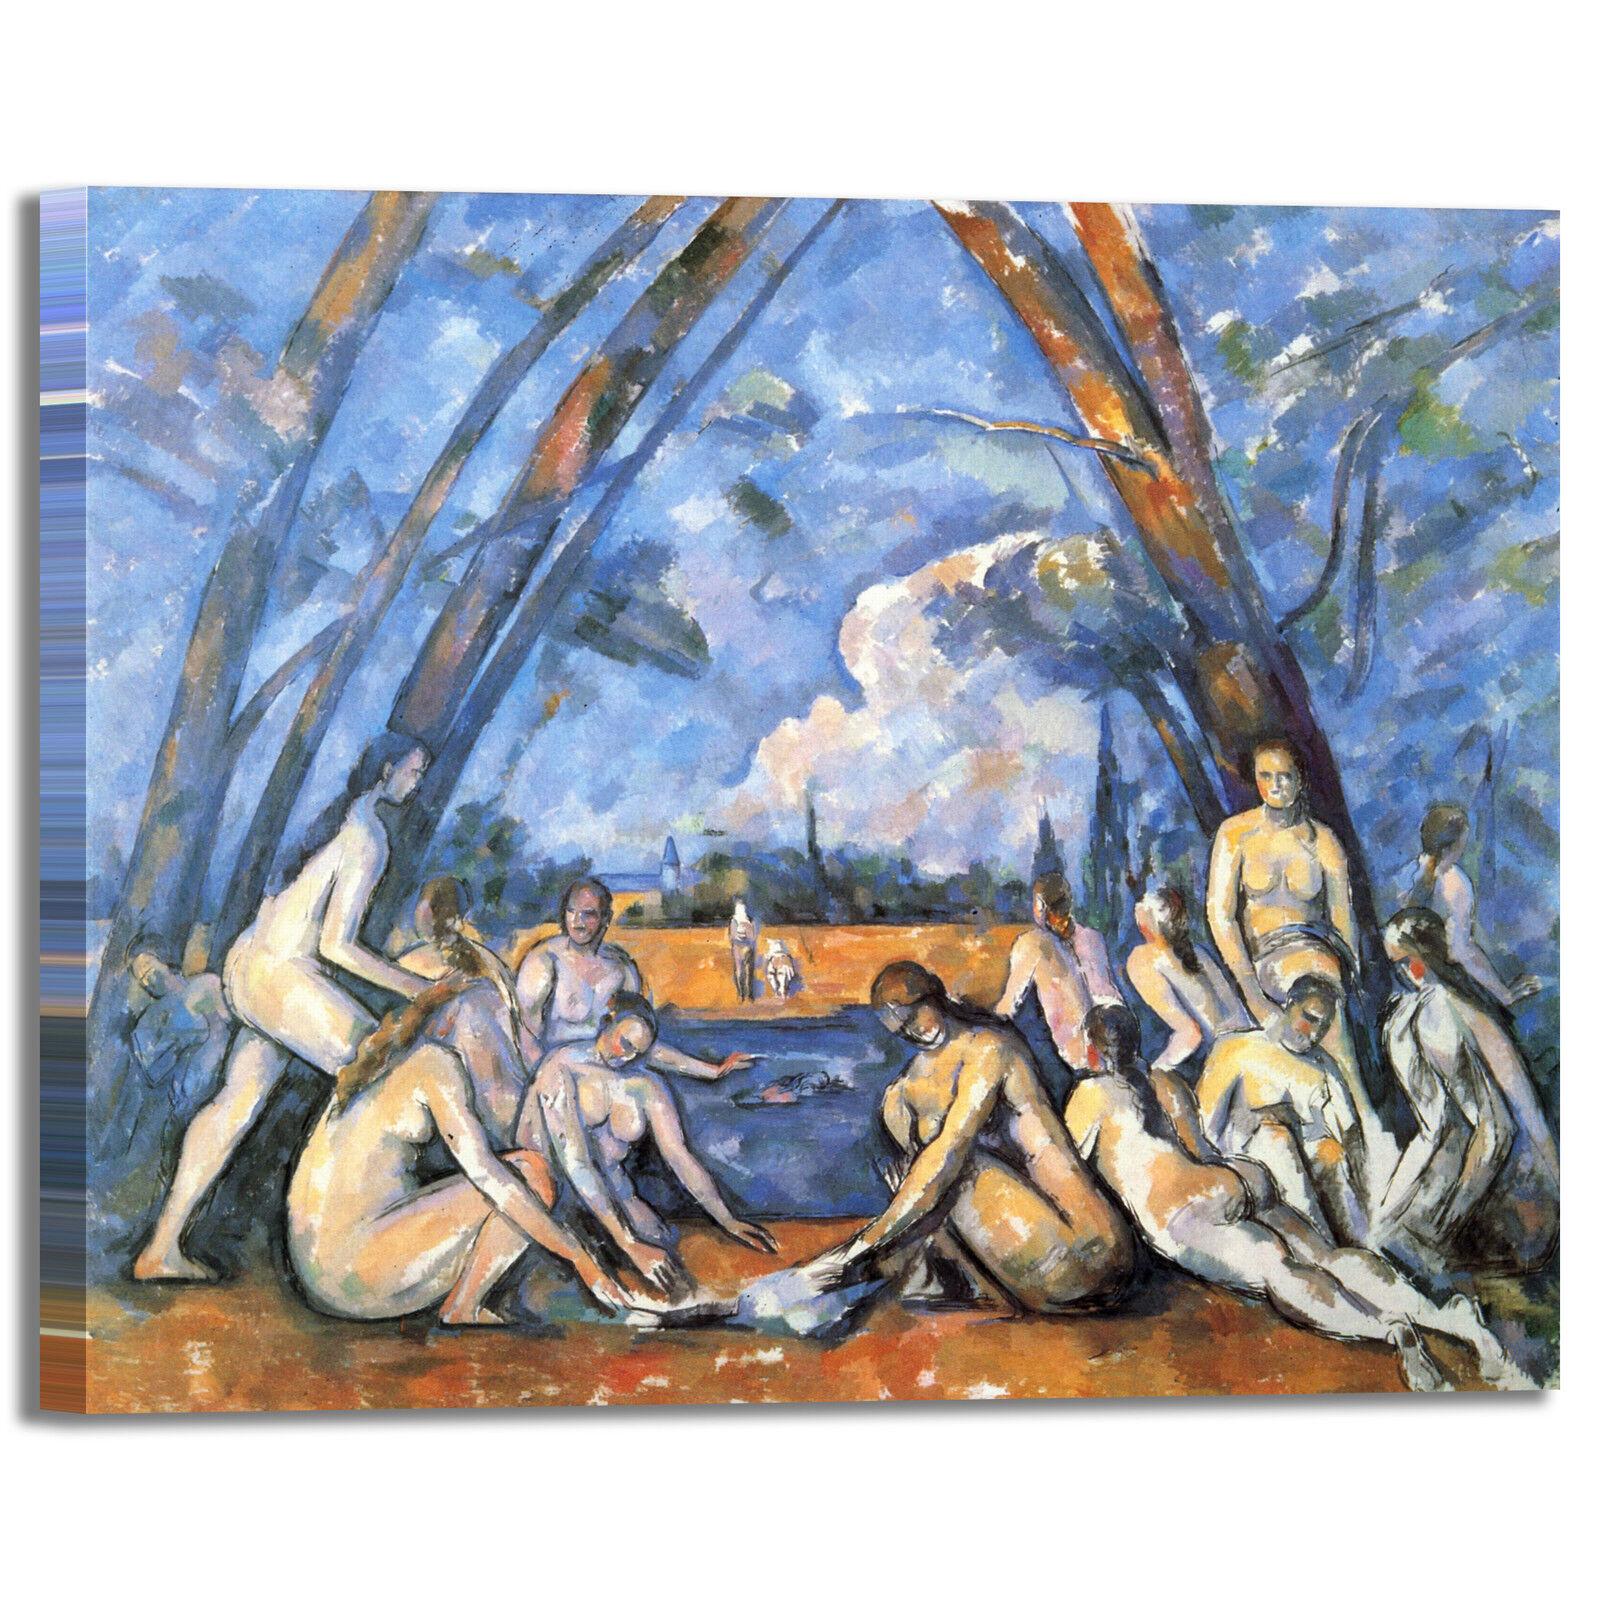 Cezanne bagnanti quadro 10 design quadro bagnanti stampa tela dipinto con telaio arRouge o casa 13dde4